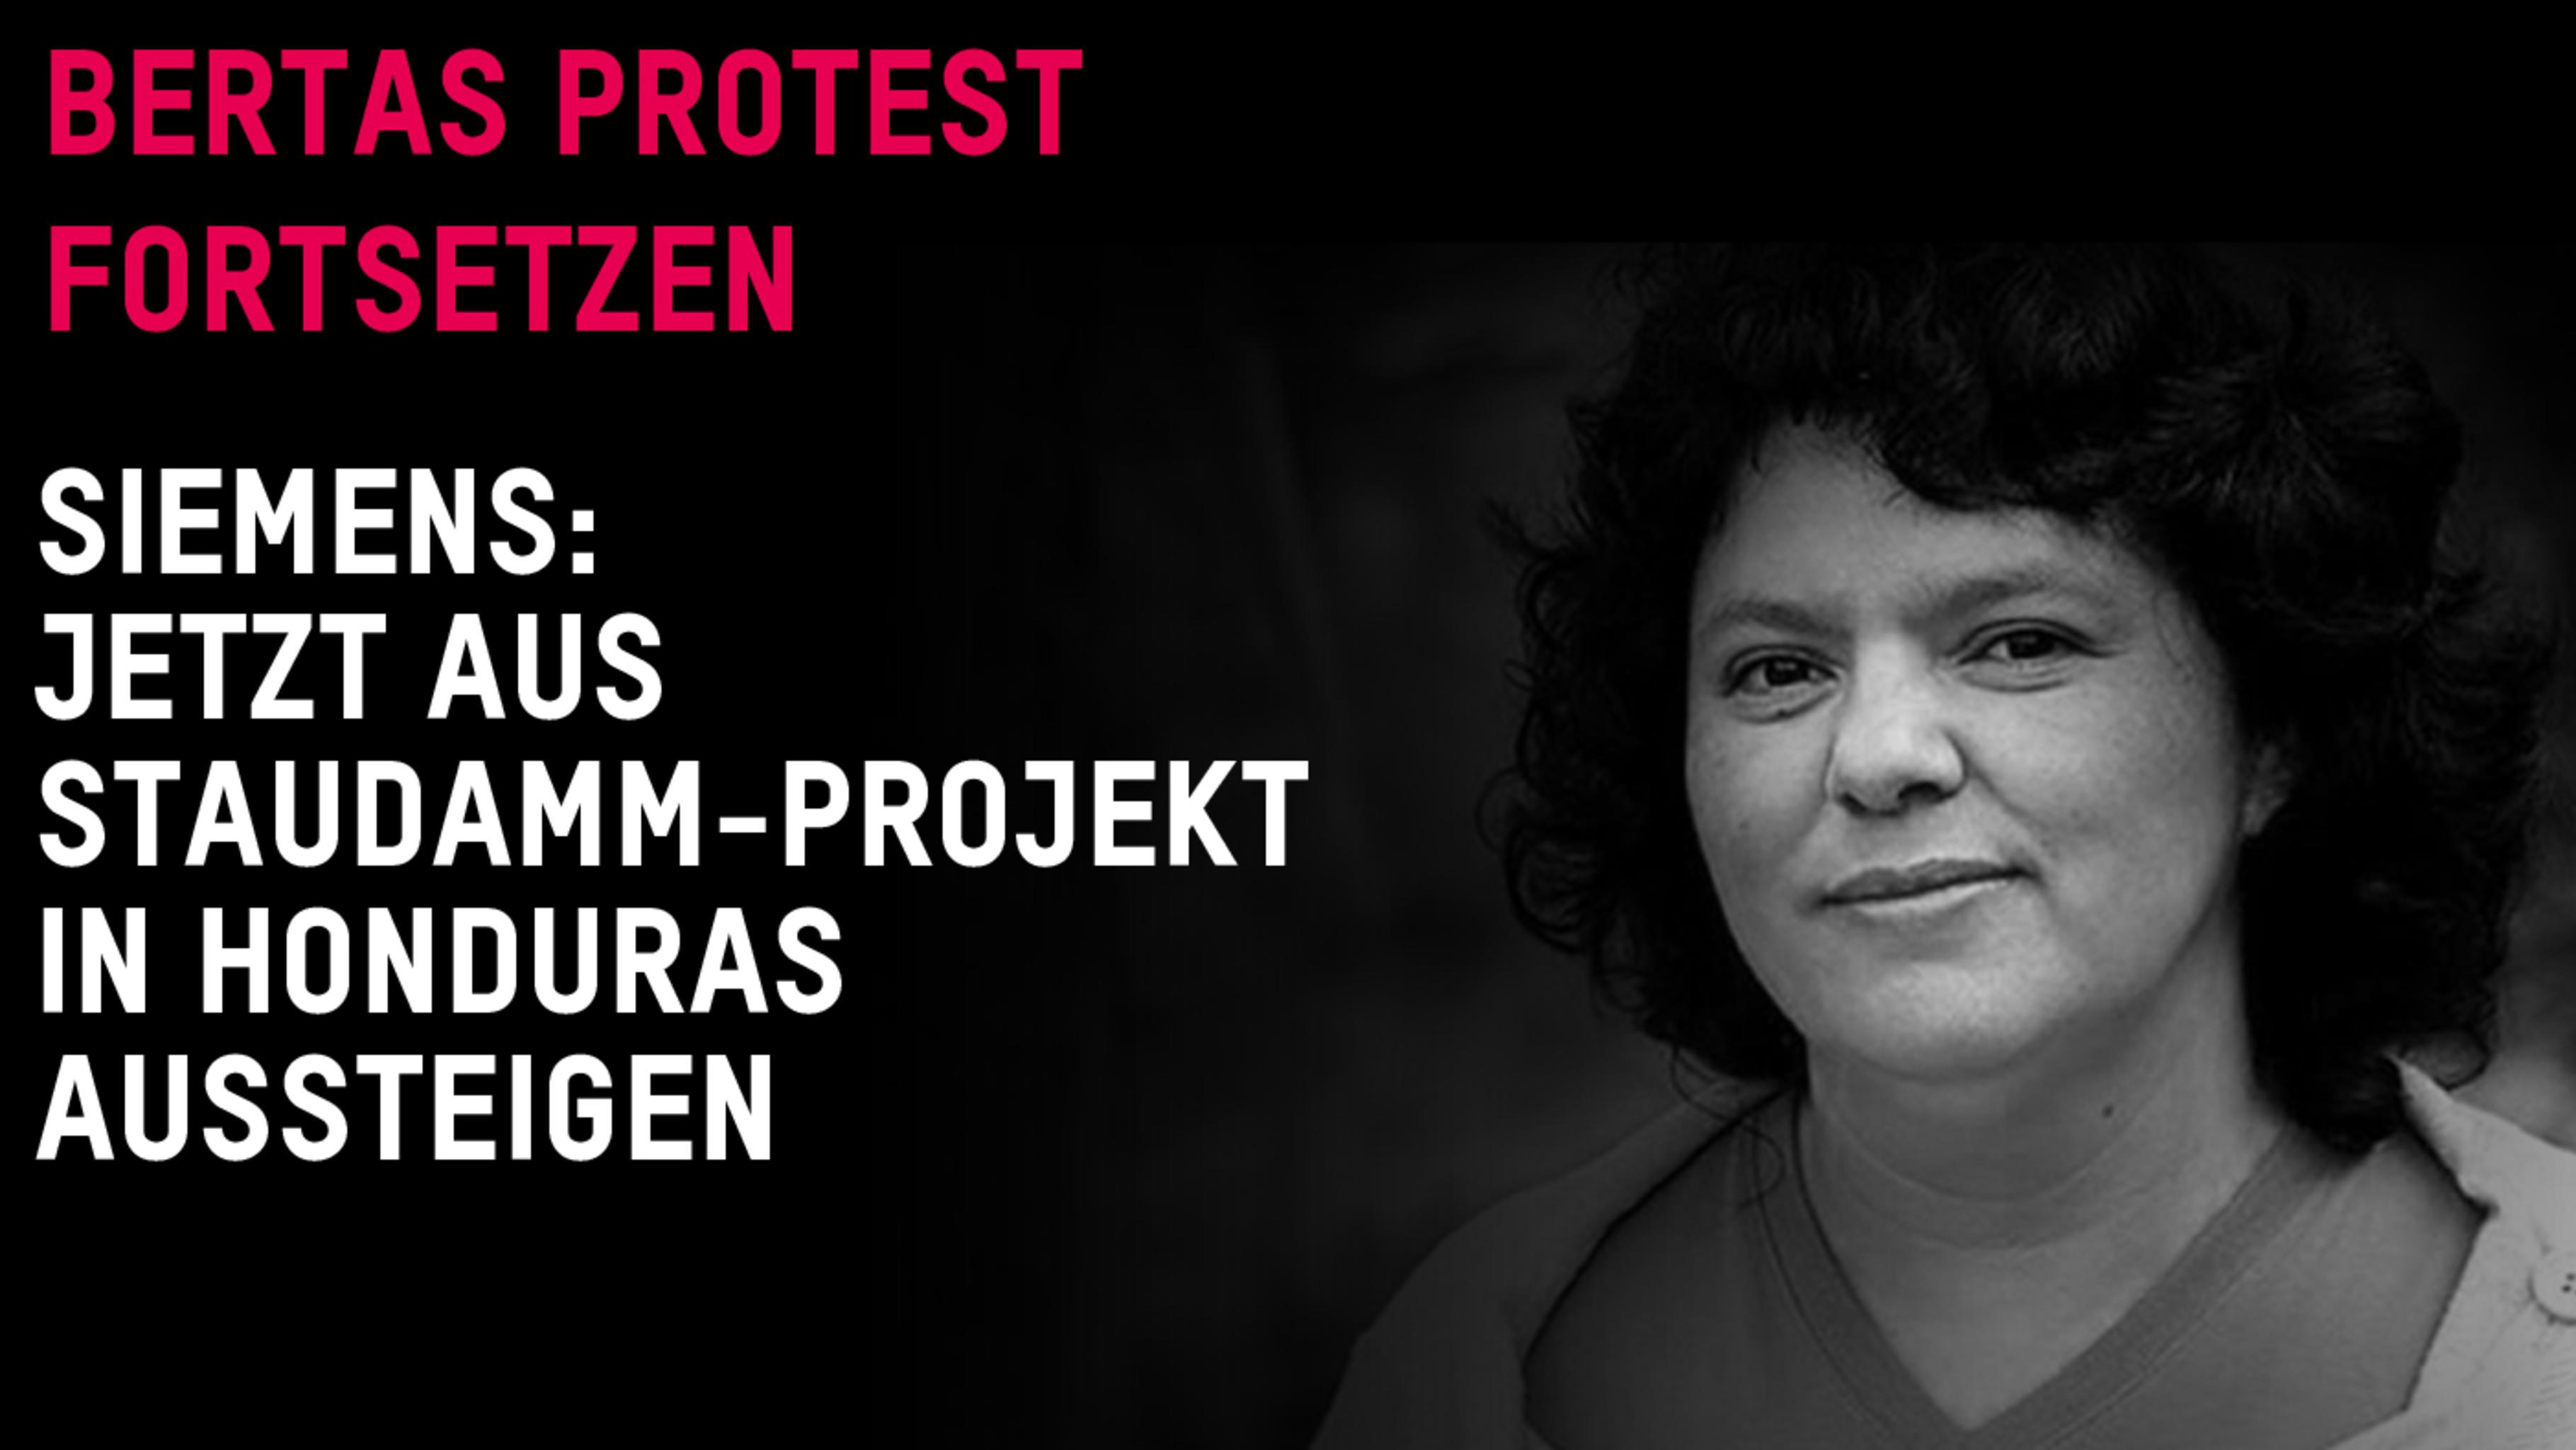 Bertas Protest fortsetzen